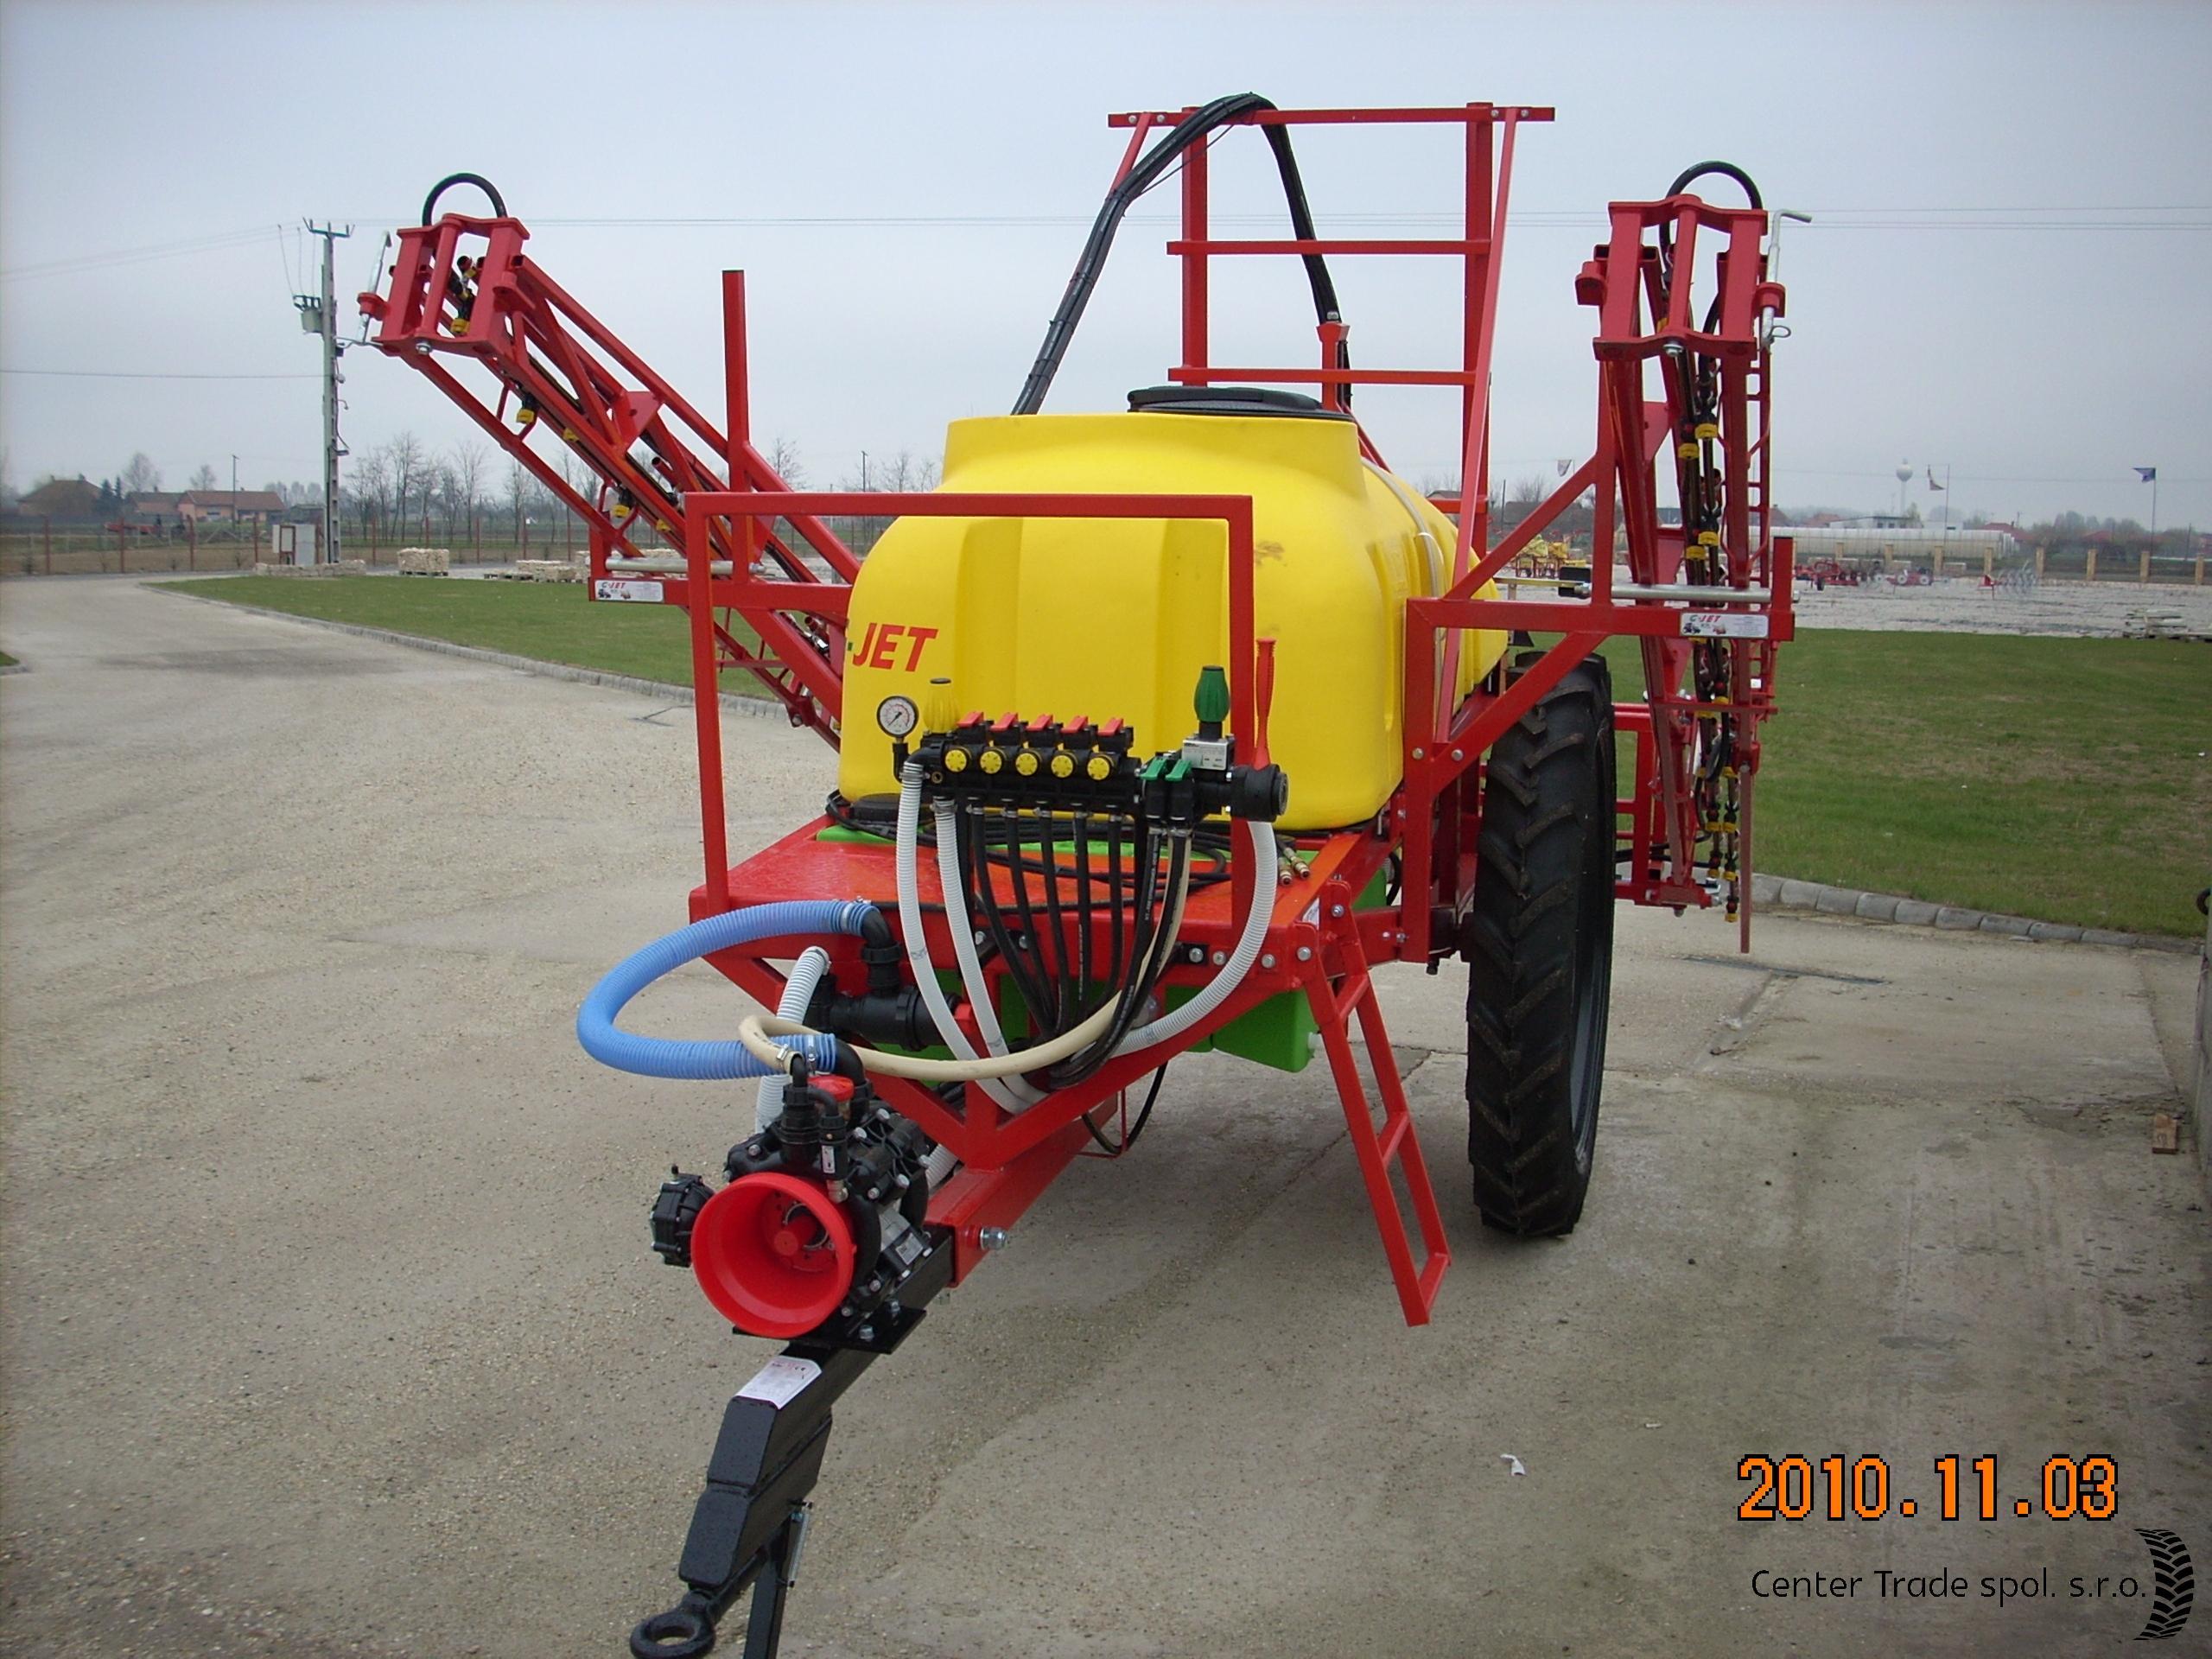 G-JET 2200 / 18 mrxhidro postrekovač